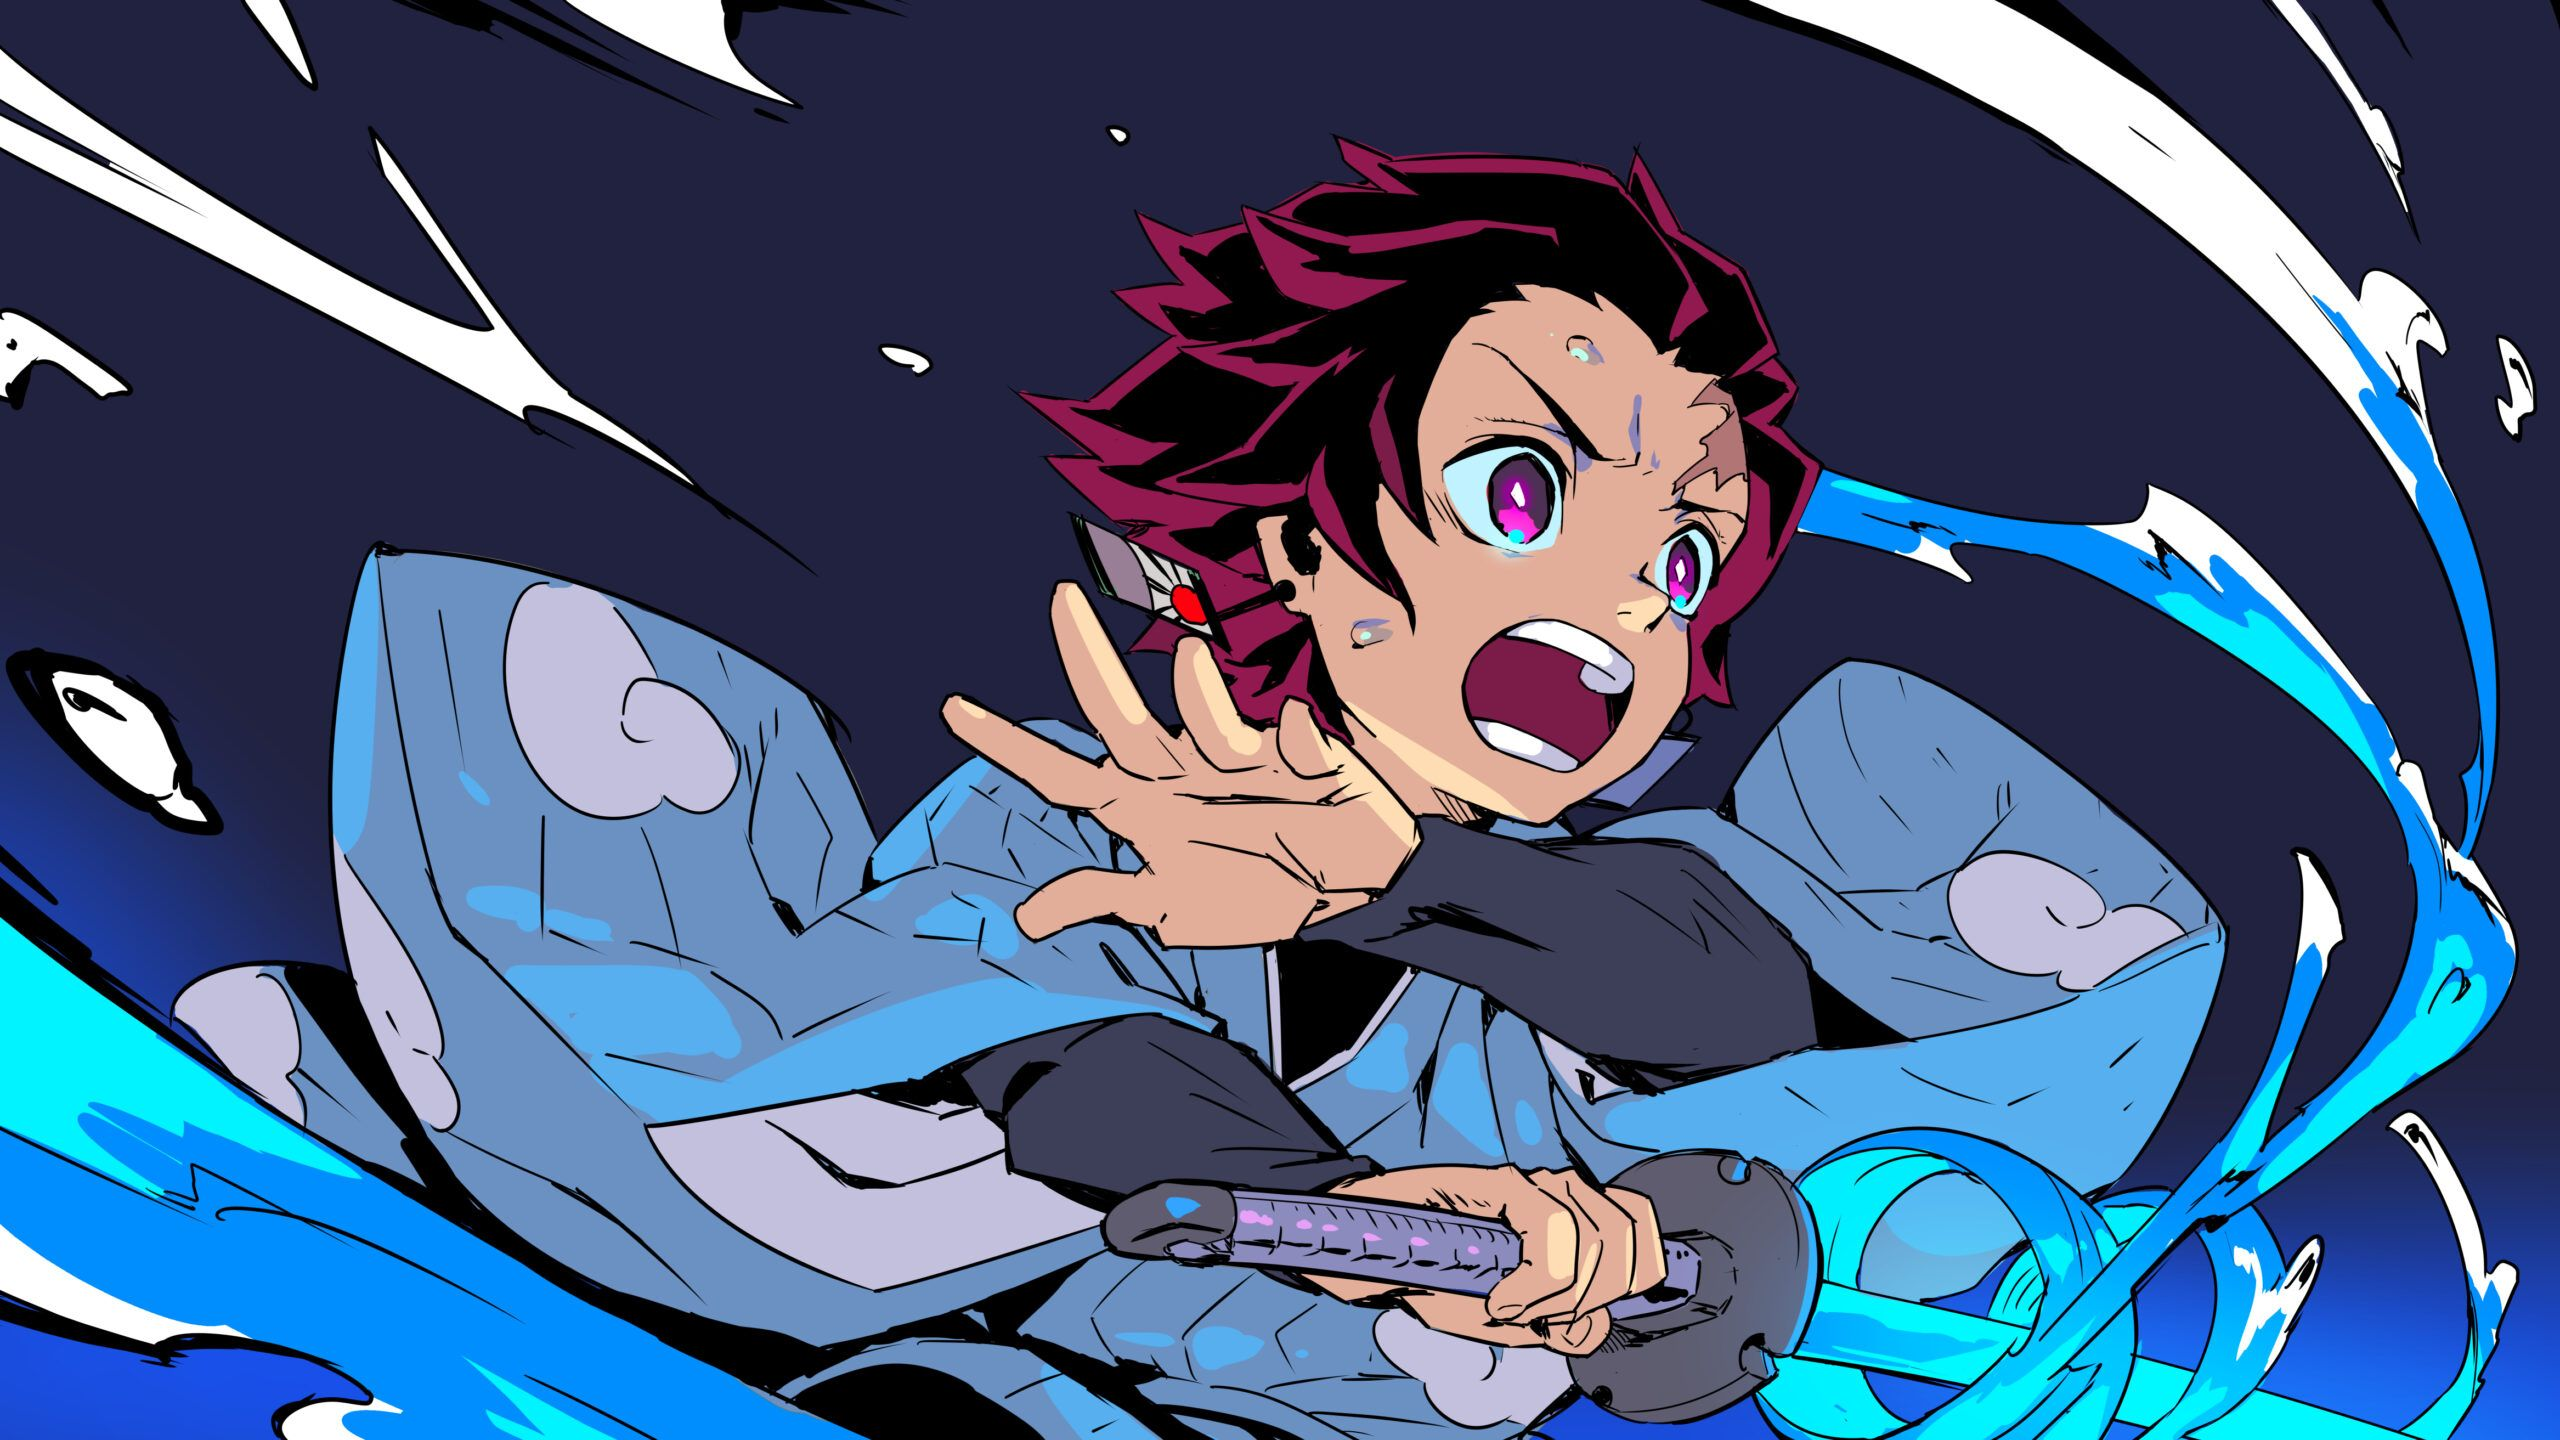 Kimetsu No Yaiba Wallpaper Hd Personagens De Anime Anime Boys Anime